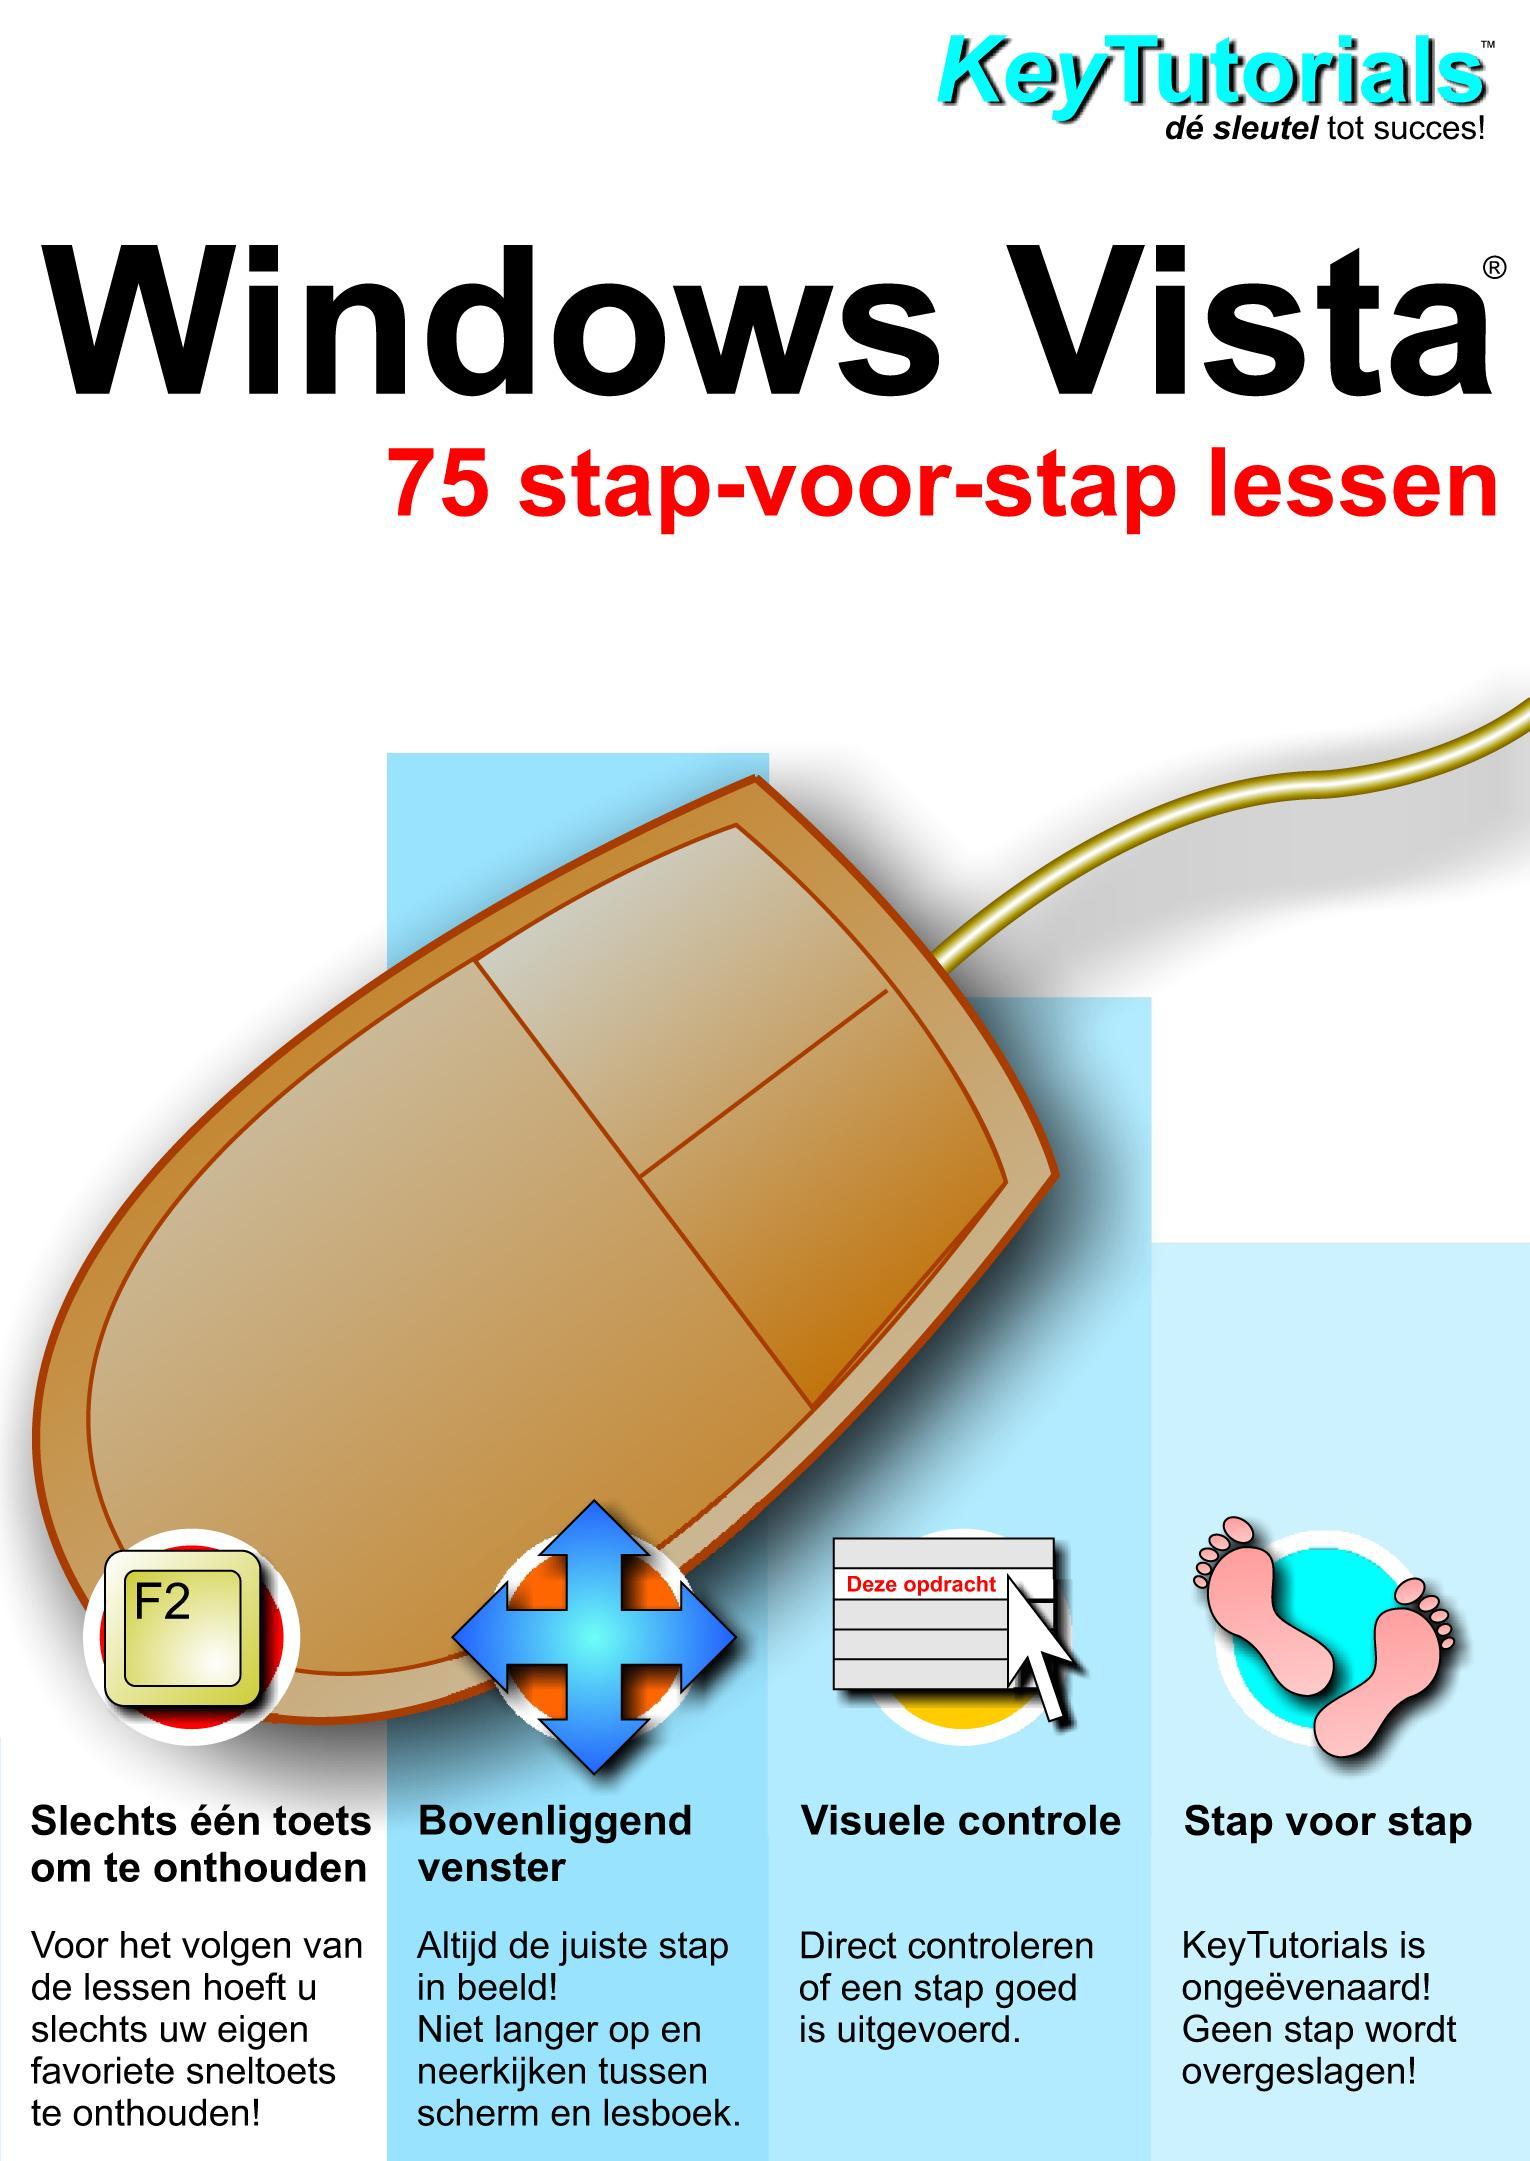 how to get imovie on windows 8